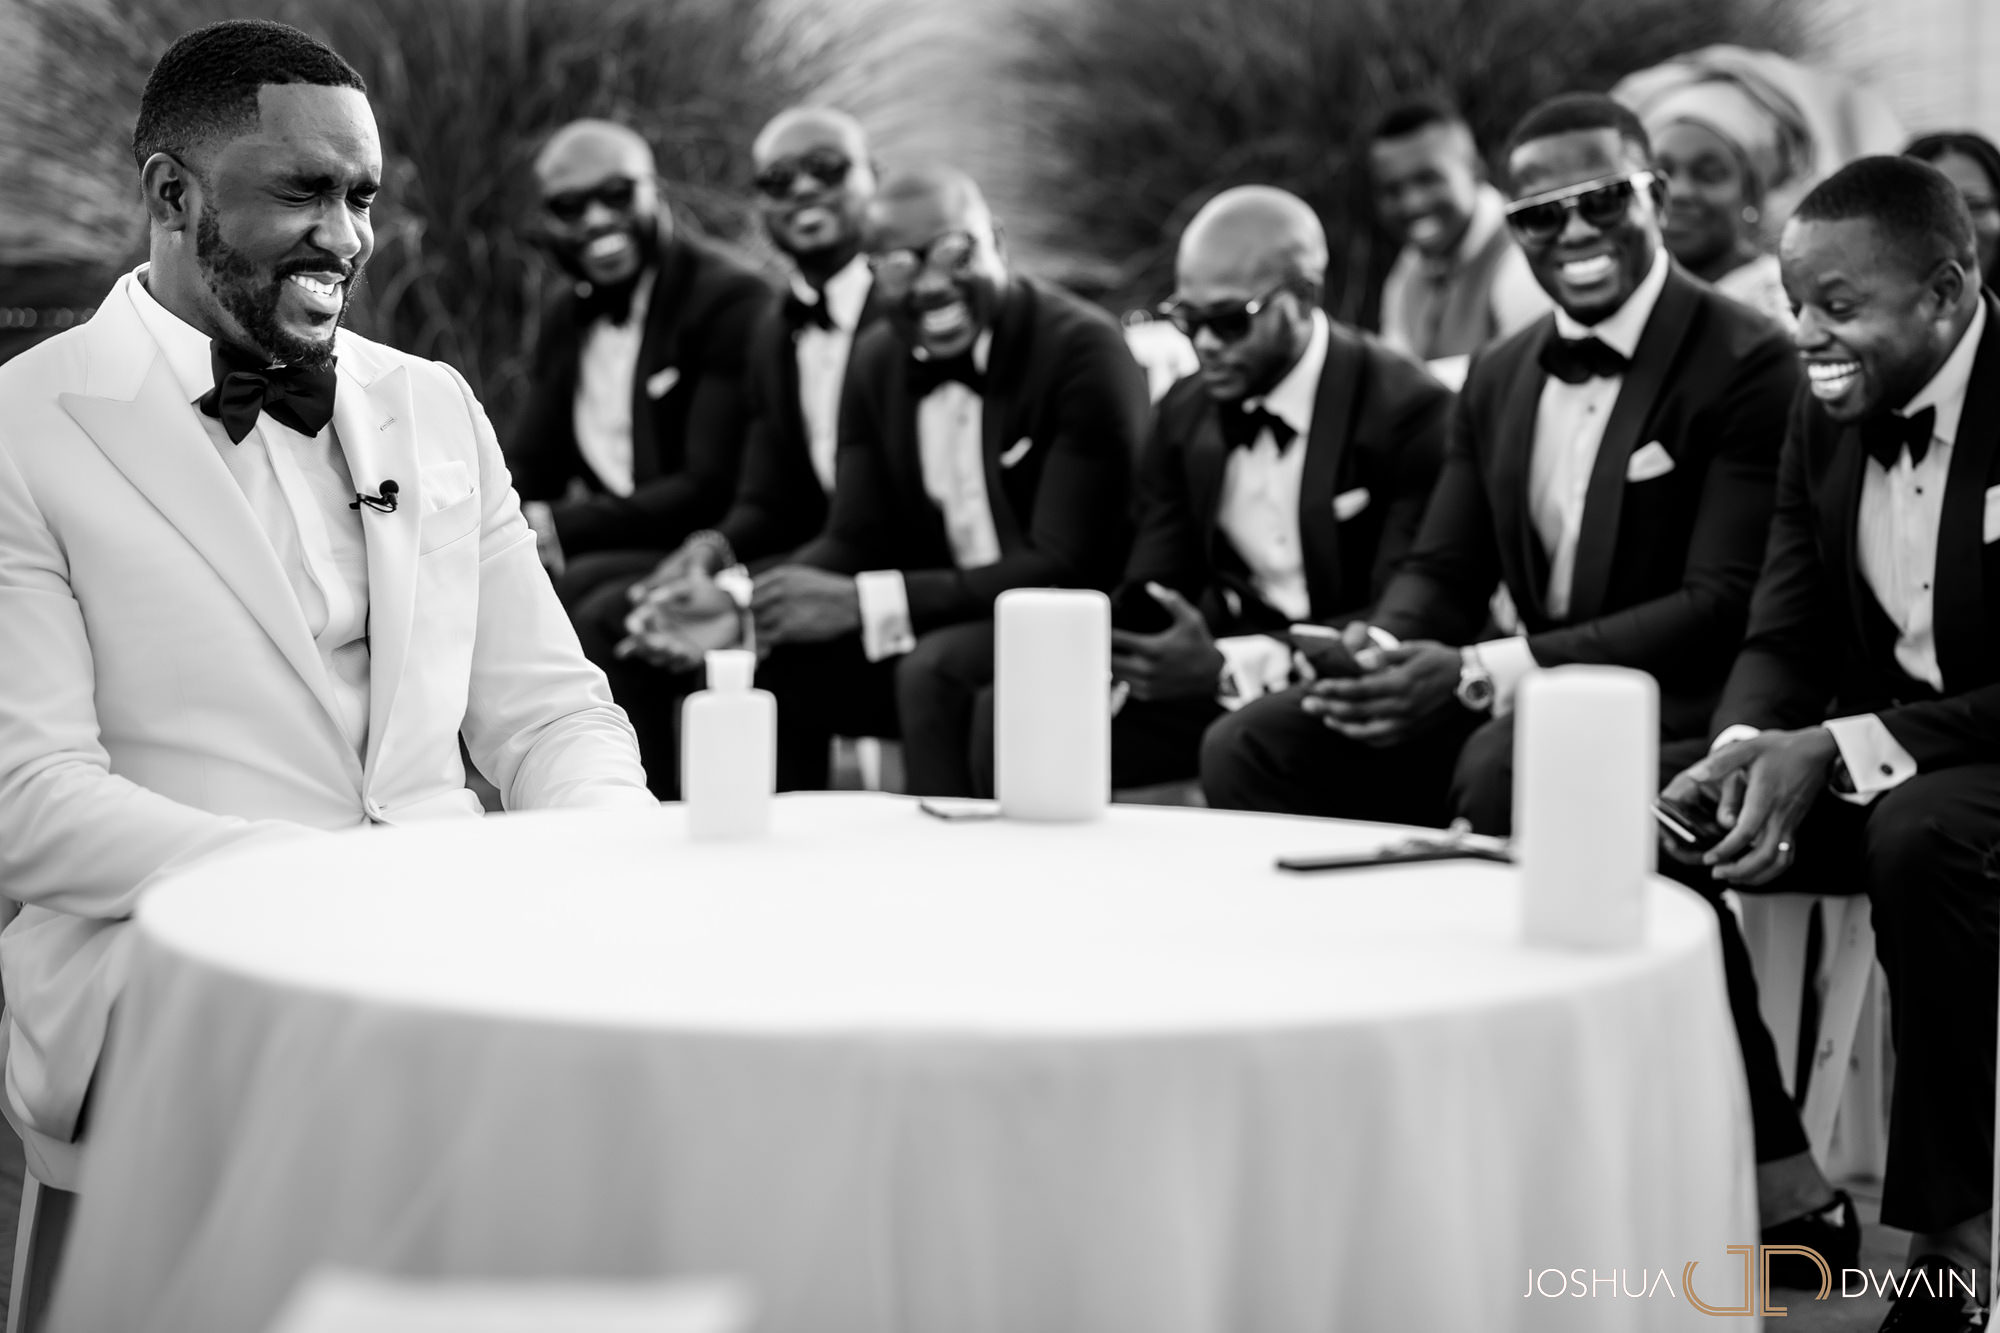 joshua-dwain-weddings-gallery-best-wedding-photographers-us-021